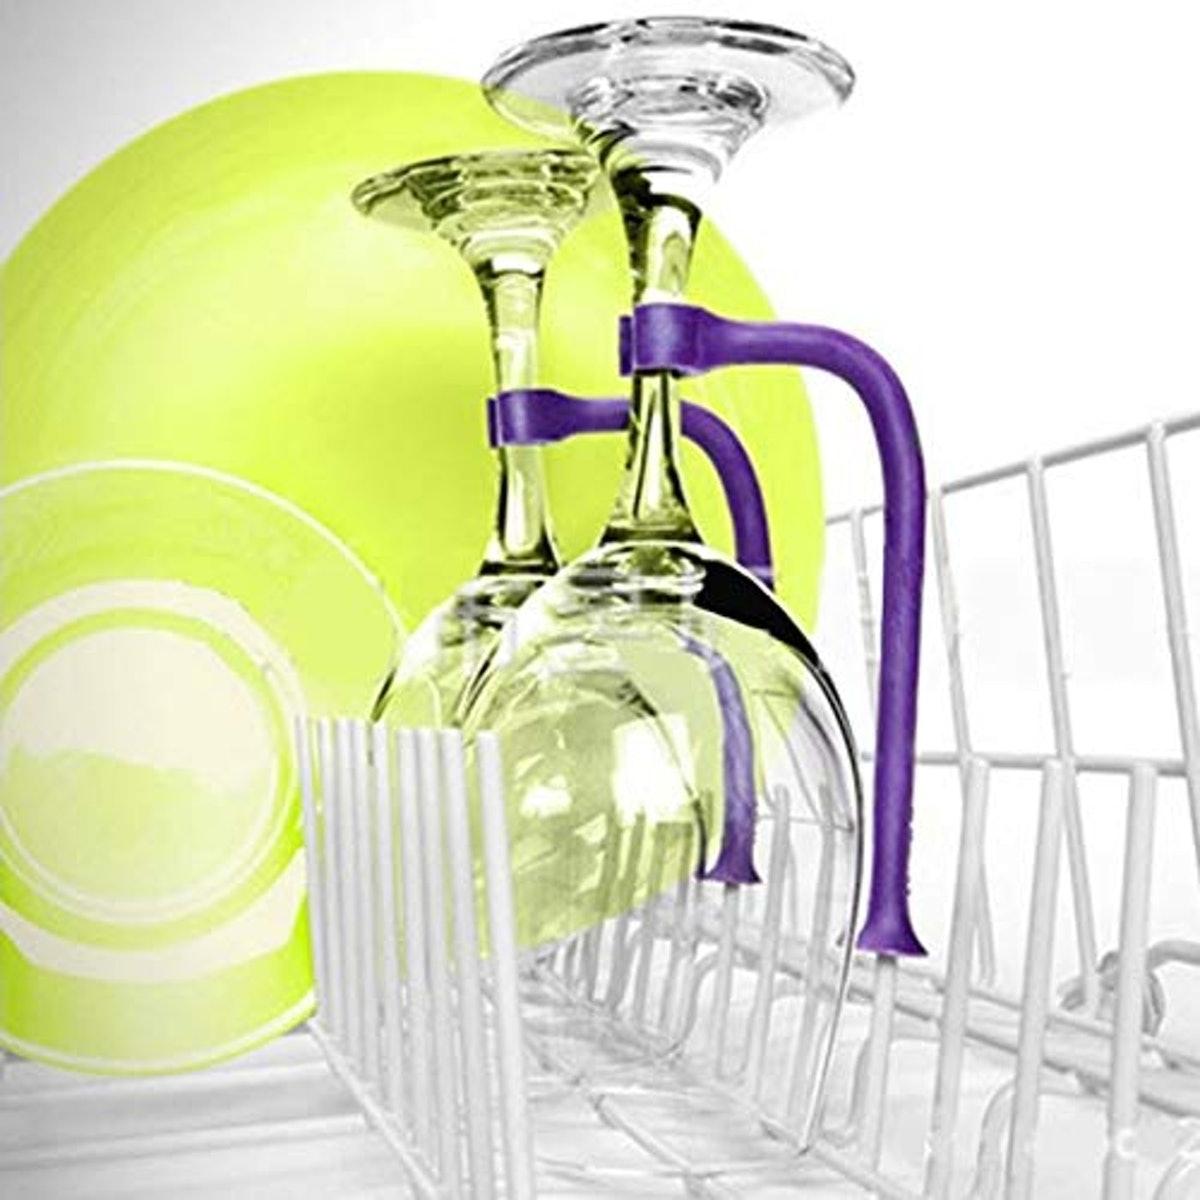 Pure Health Silicone Wine Glass Holders